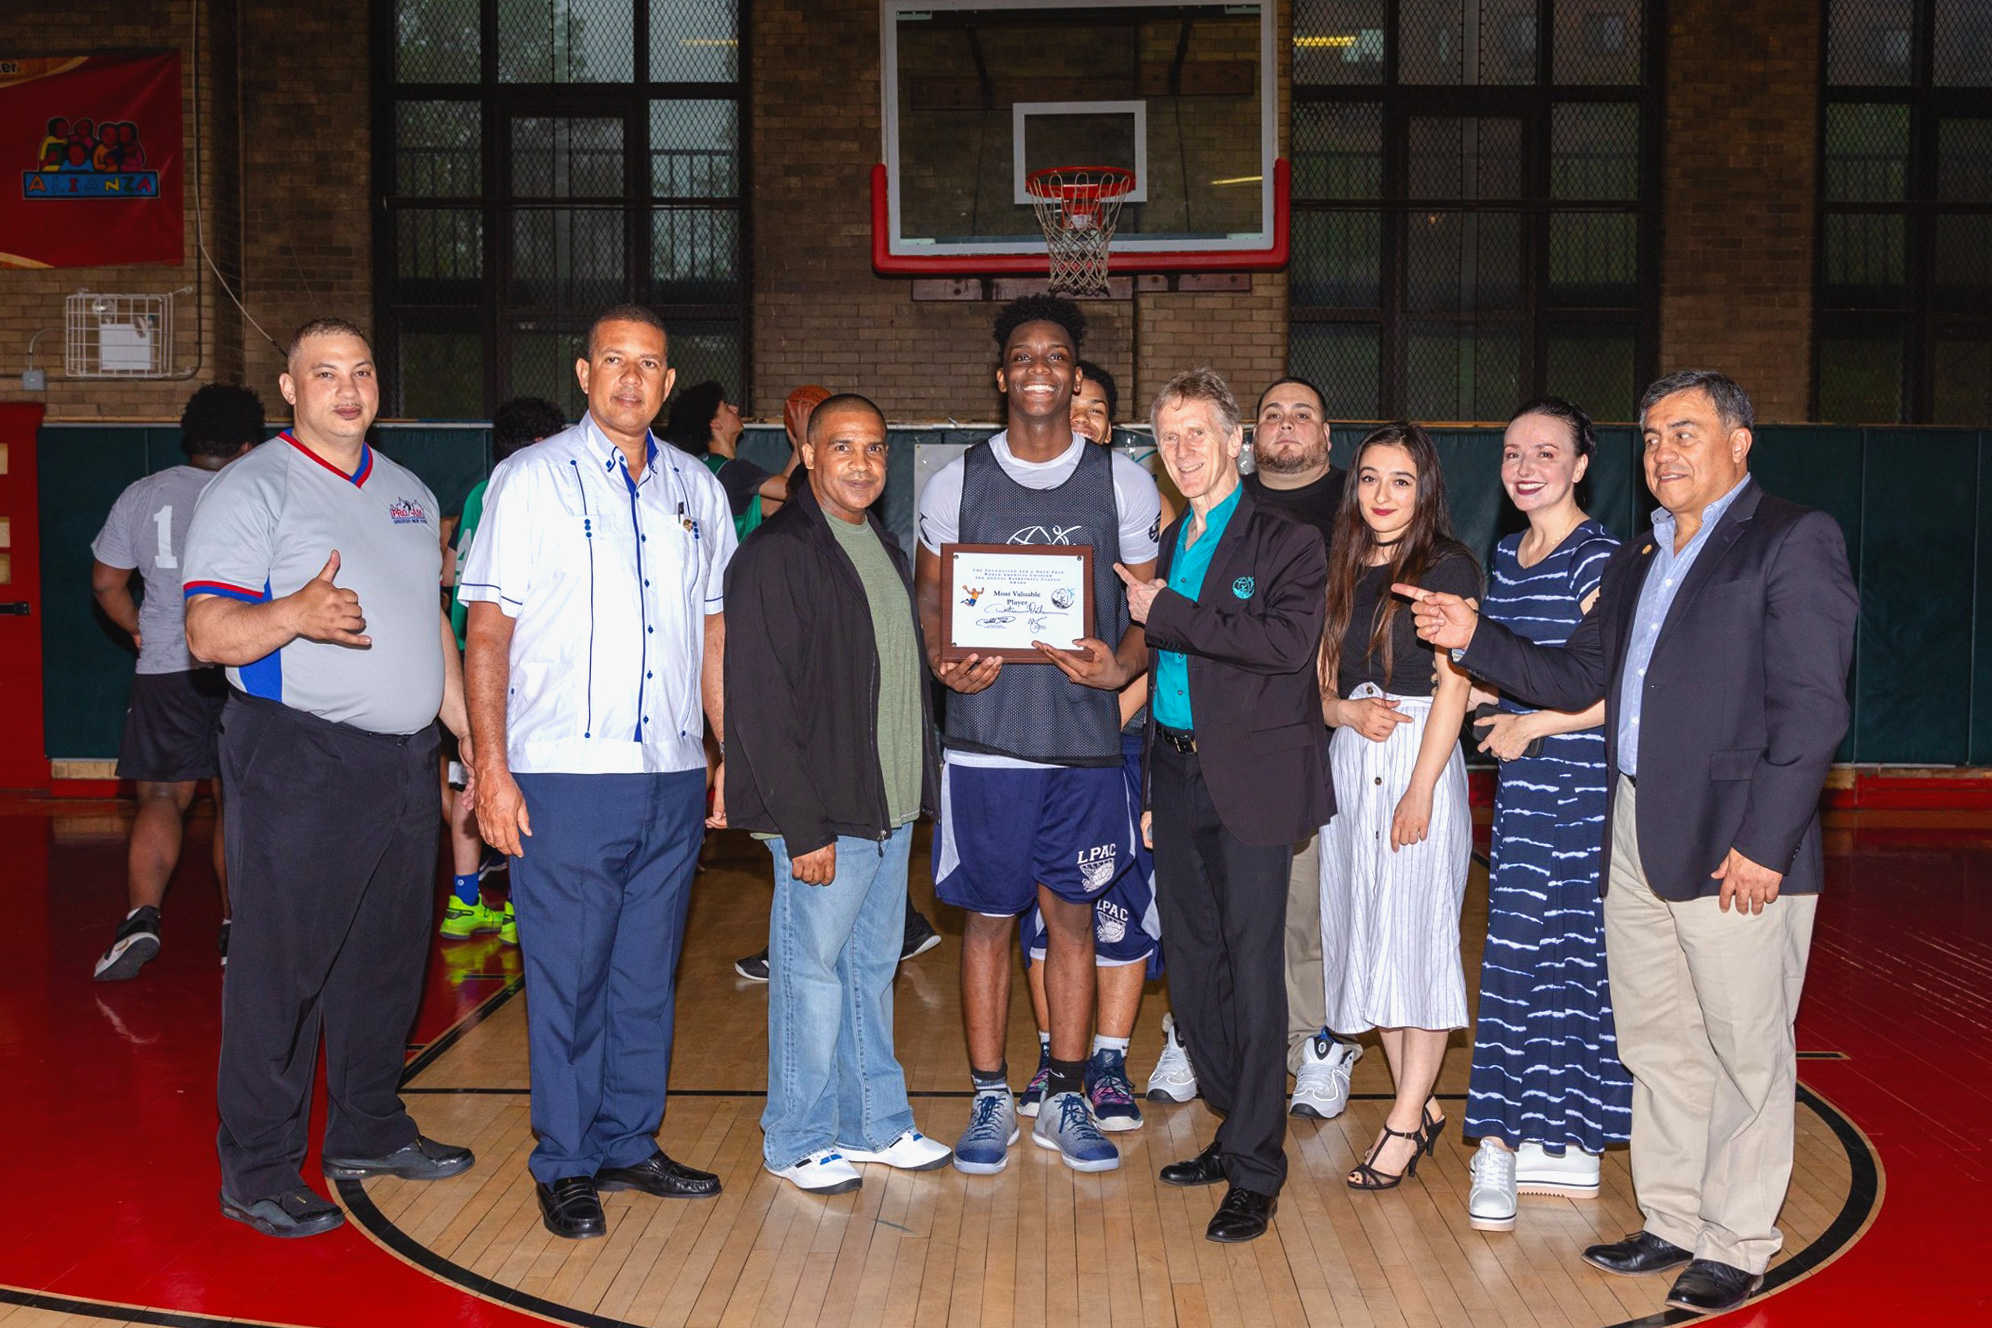 2nd-Annual-Drug-Free-Basketball-Tournament-06.jpg